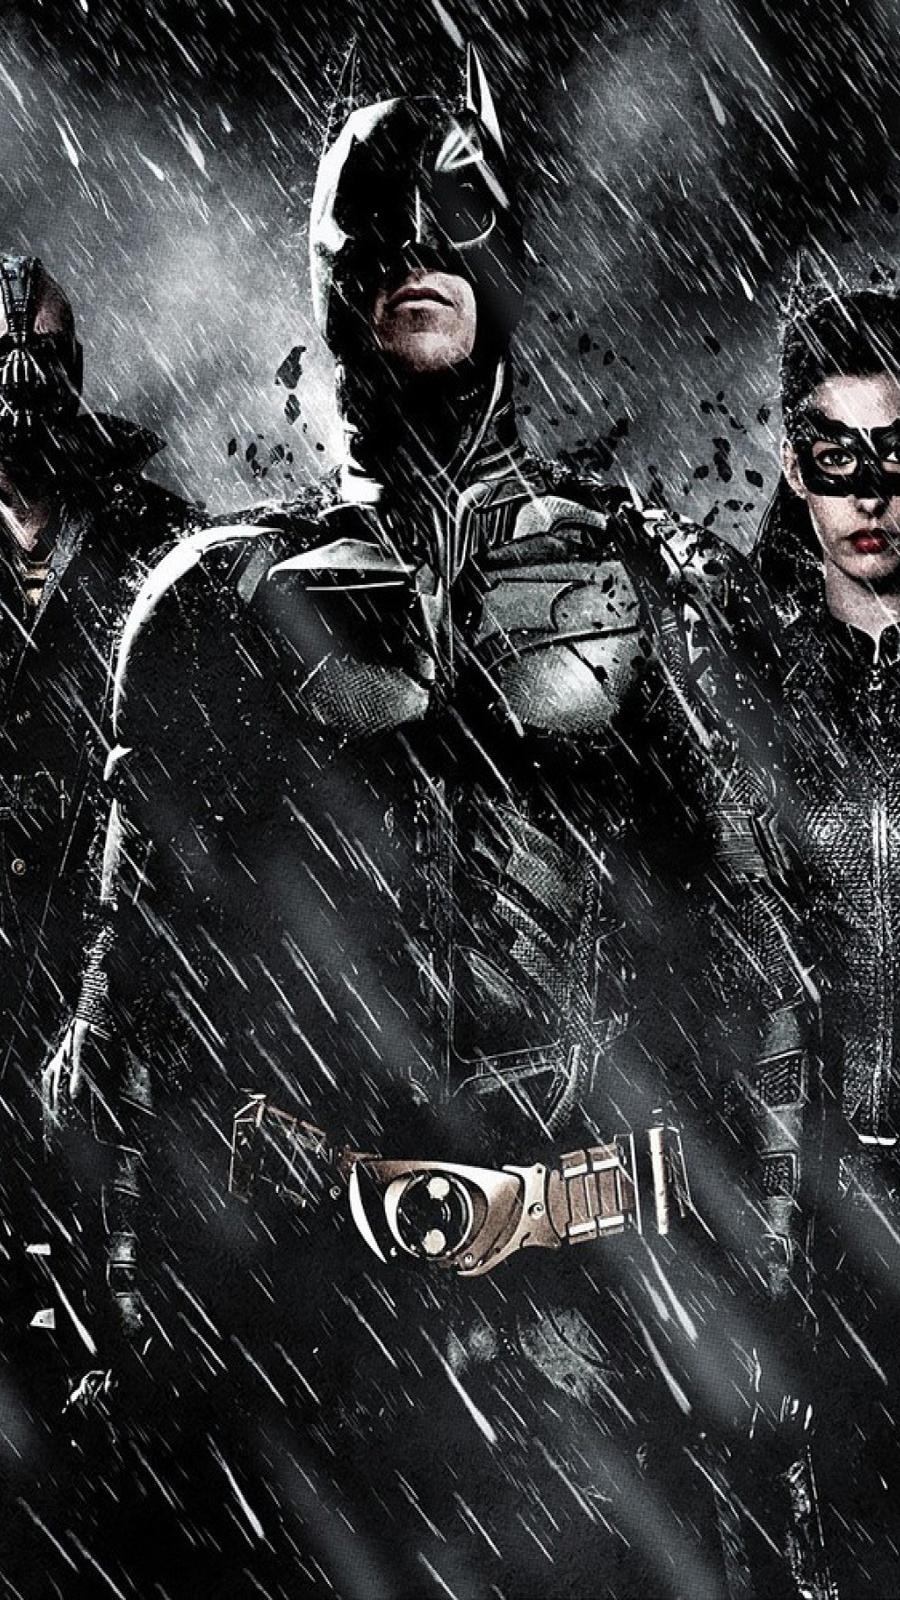 Batman & Catwoman HD Wallpapers Free Download